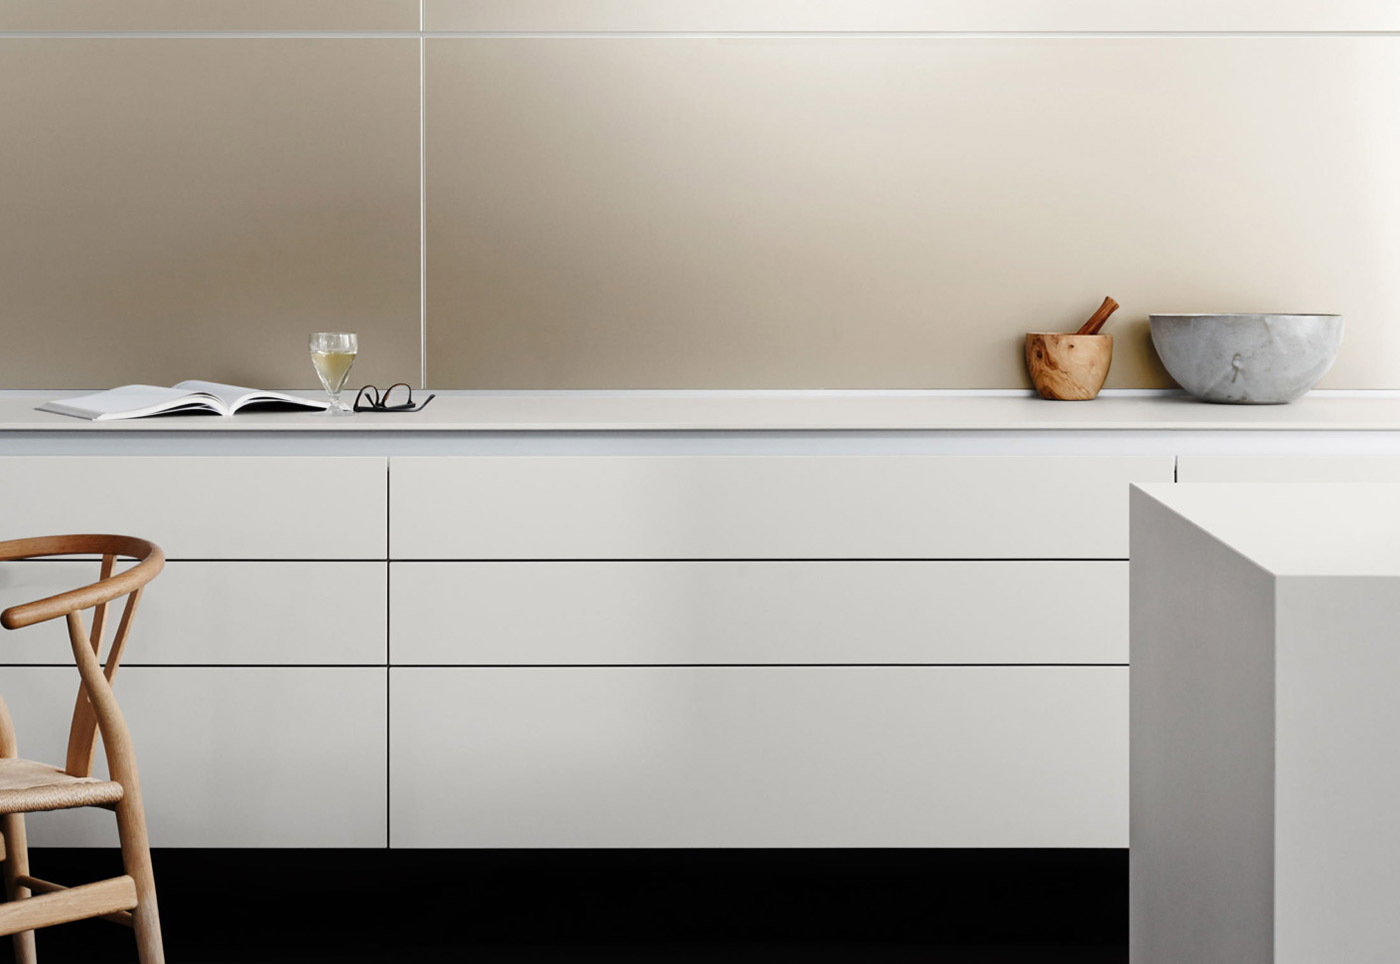 Obegi-Home-Bulthaup-Kitchens-b3-Multifunktionswand-03